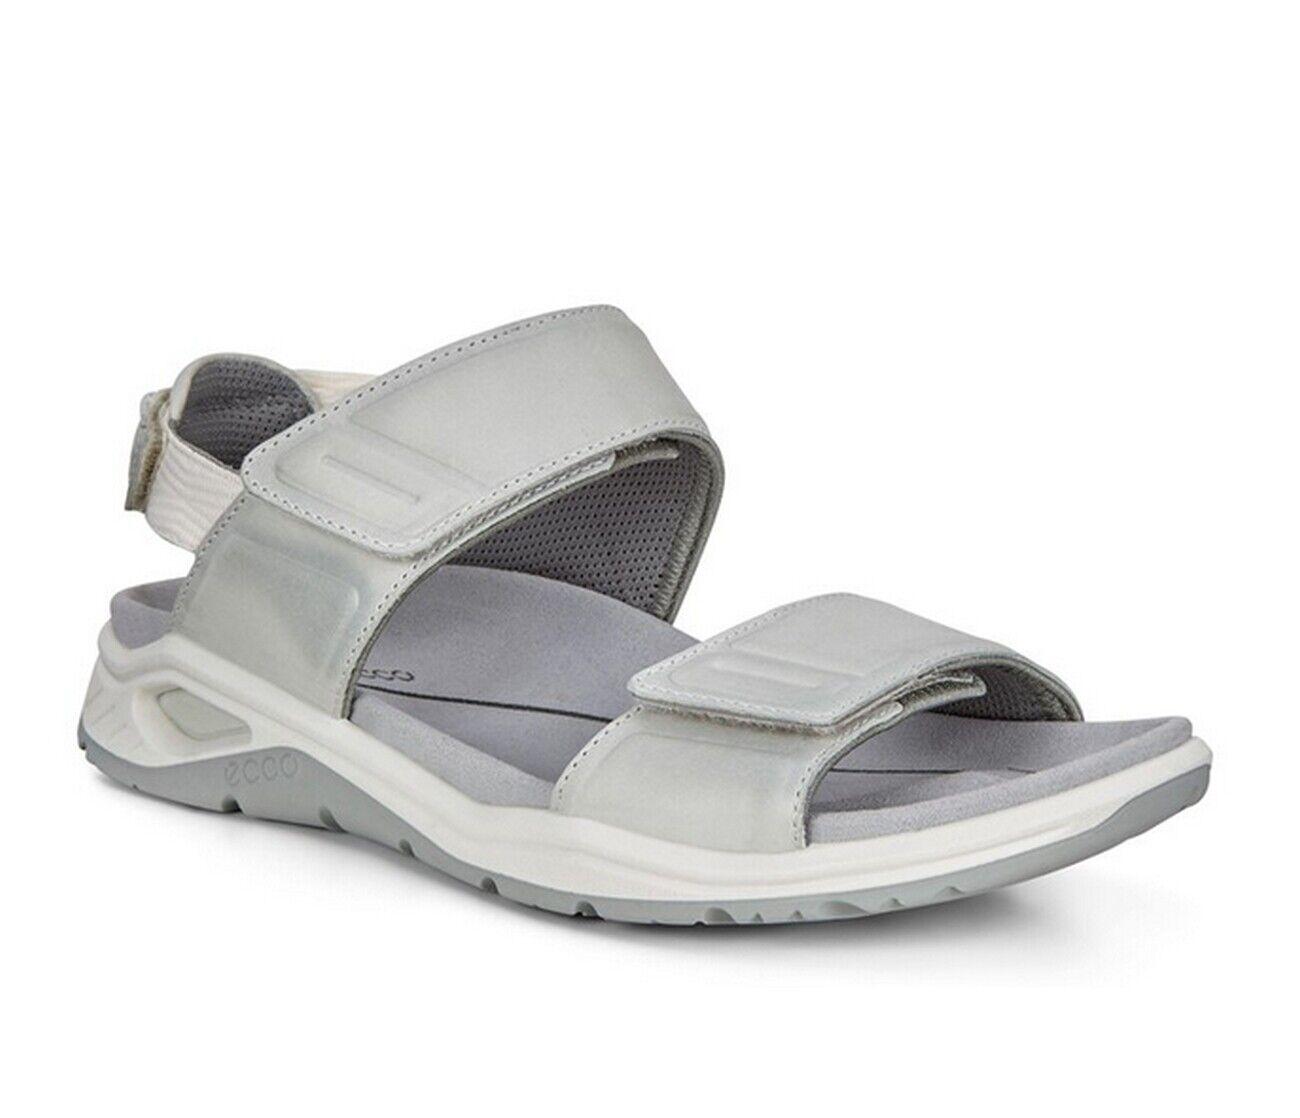 ECCO X-Trinsic Sandale white 880613-01007